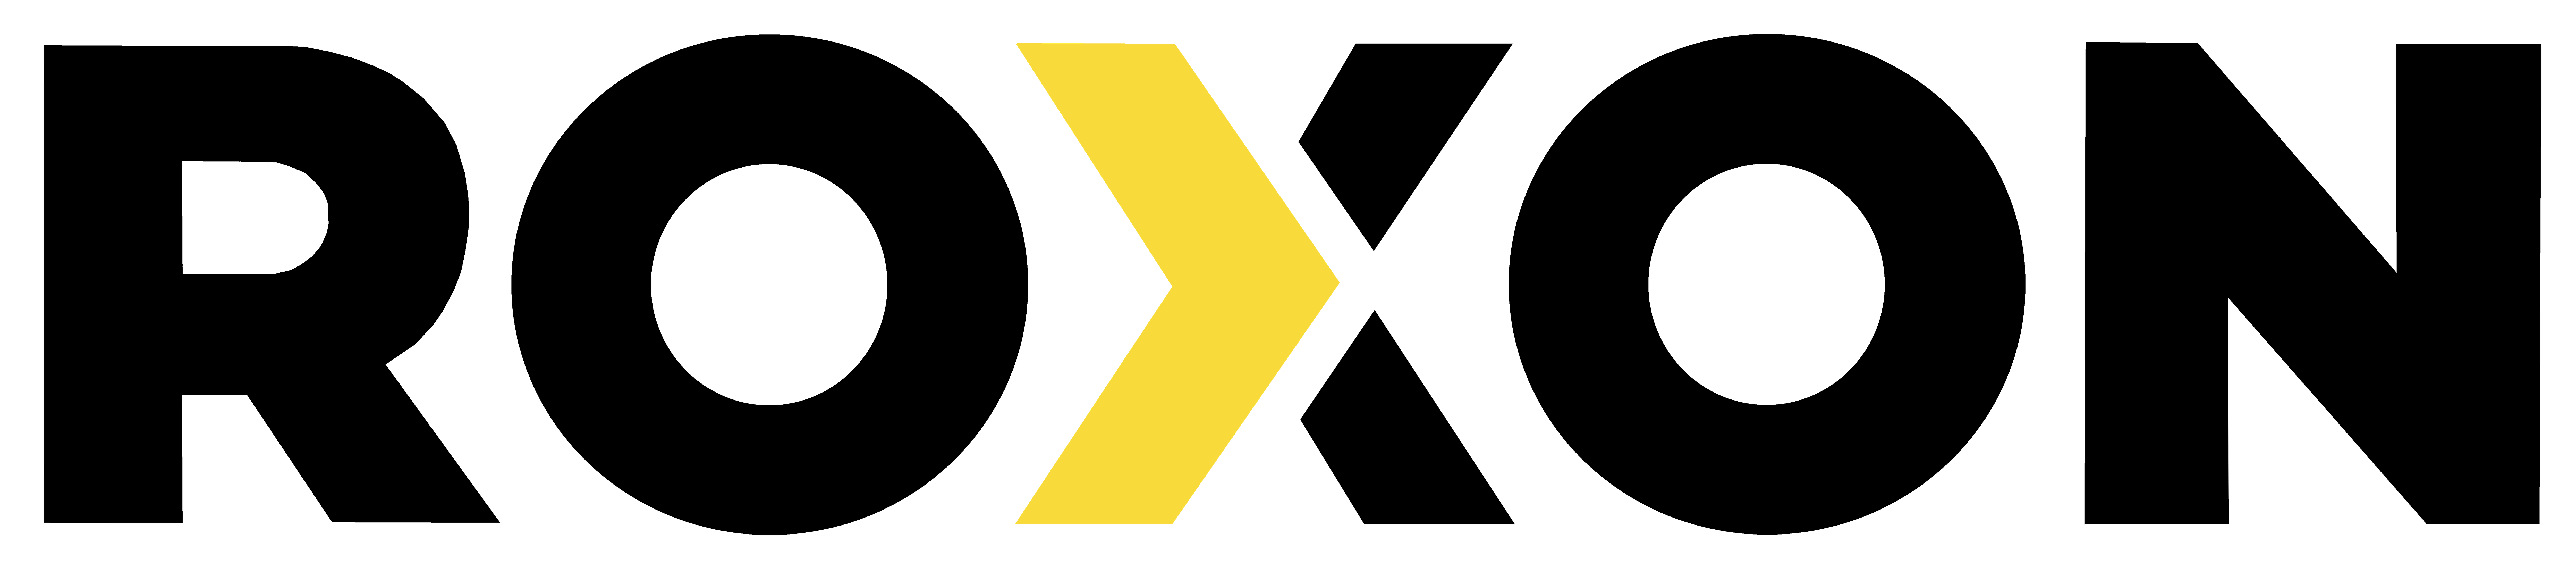 logo: Roxon, Nepean Conveyors OY